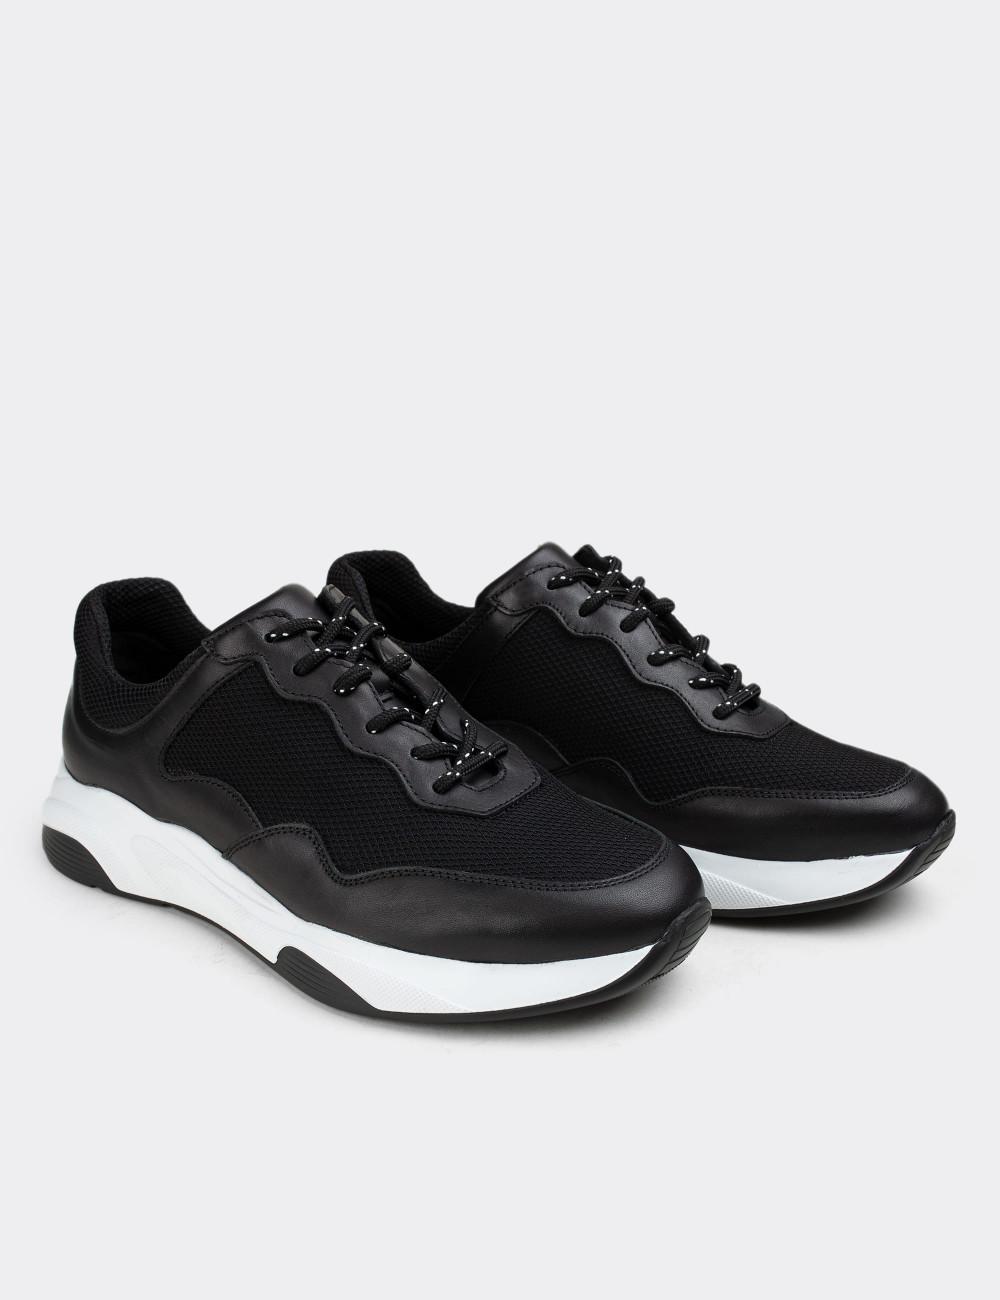 Hakiki Deri Siyah Sneaker Erkek Ayakkabı - 01725MSYHE03